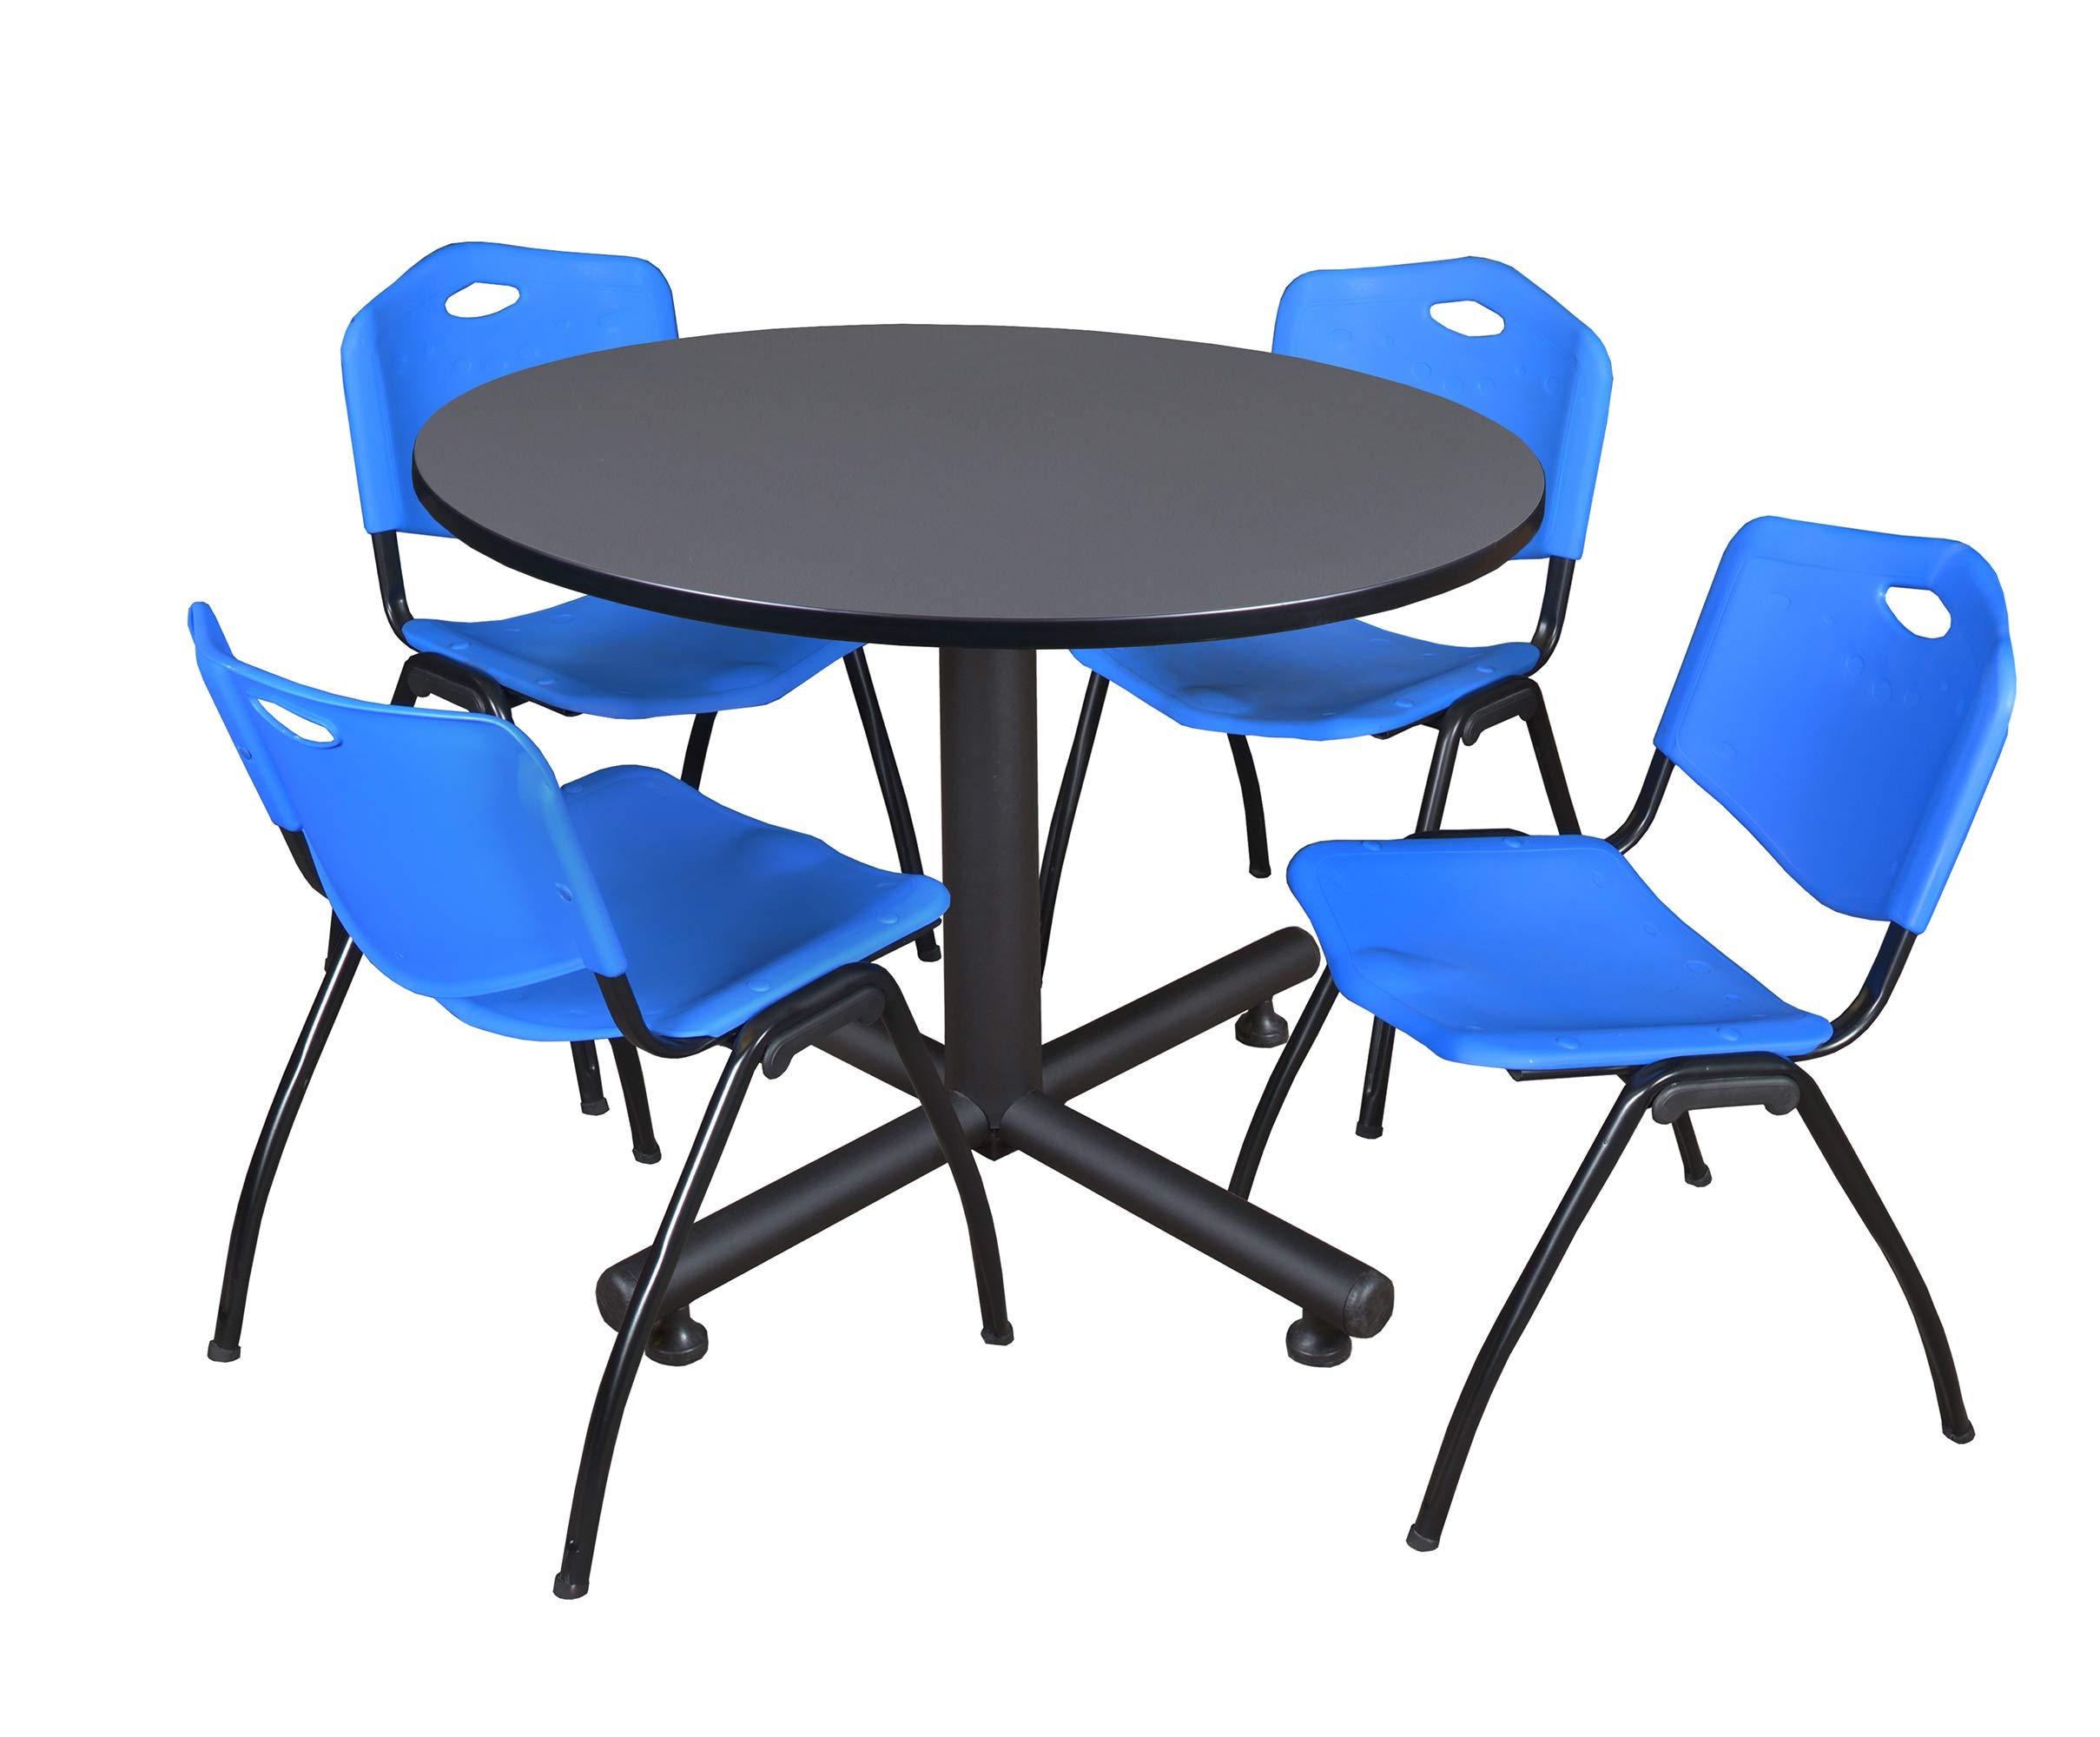 Regency Kobe 48-Inch Round Breakroom Table, Grey, and 4 M Stack Chairs, Blue by Regency Seating